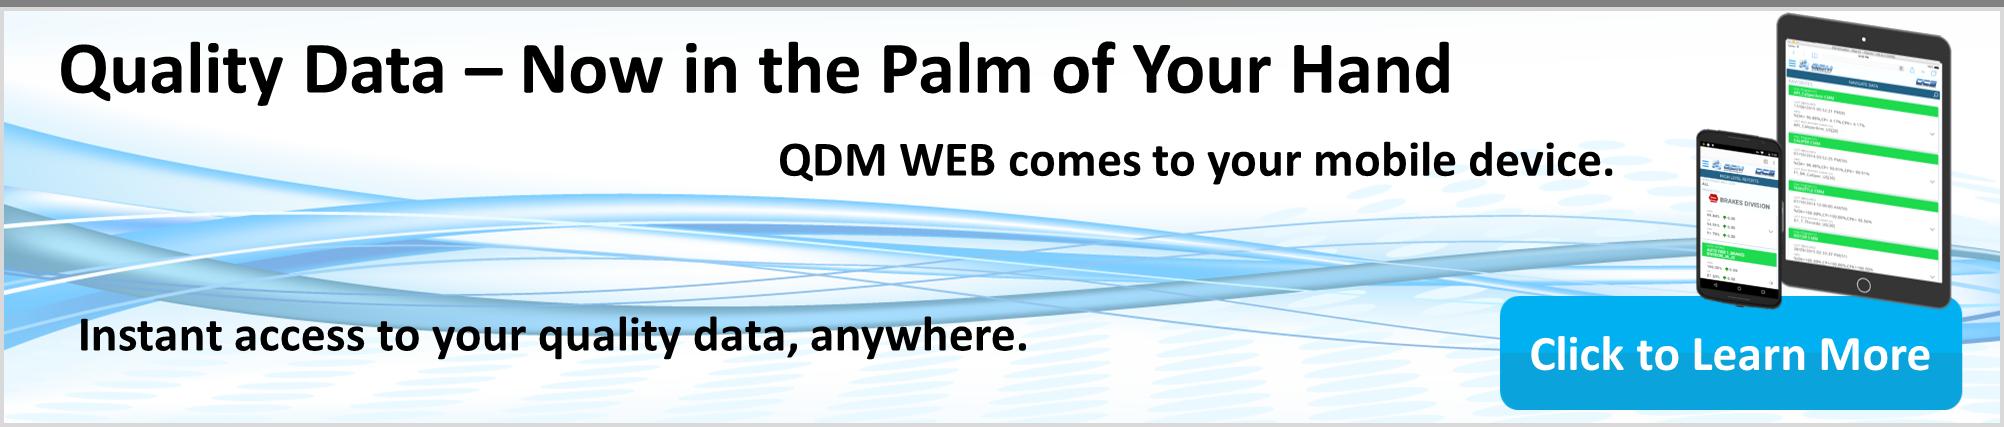 Learn About QDM